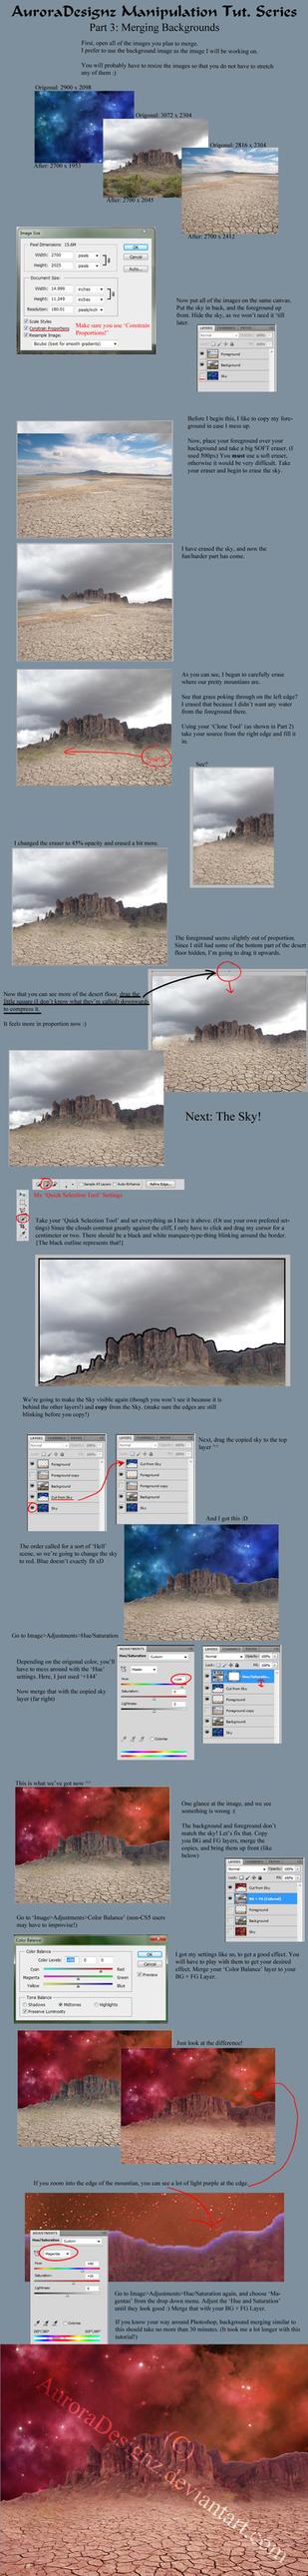 AuroraTutSeries Part 3: Merging Backgrounds by xxAuroraStudios